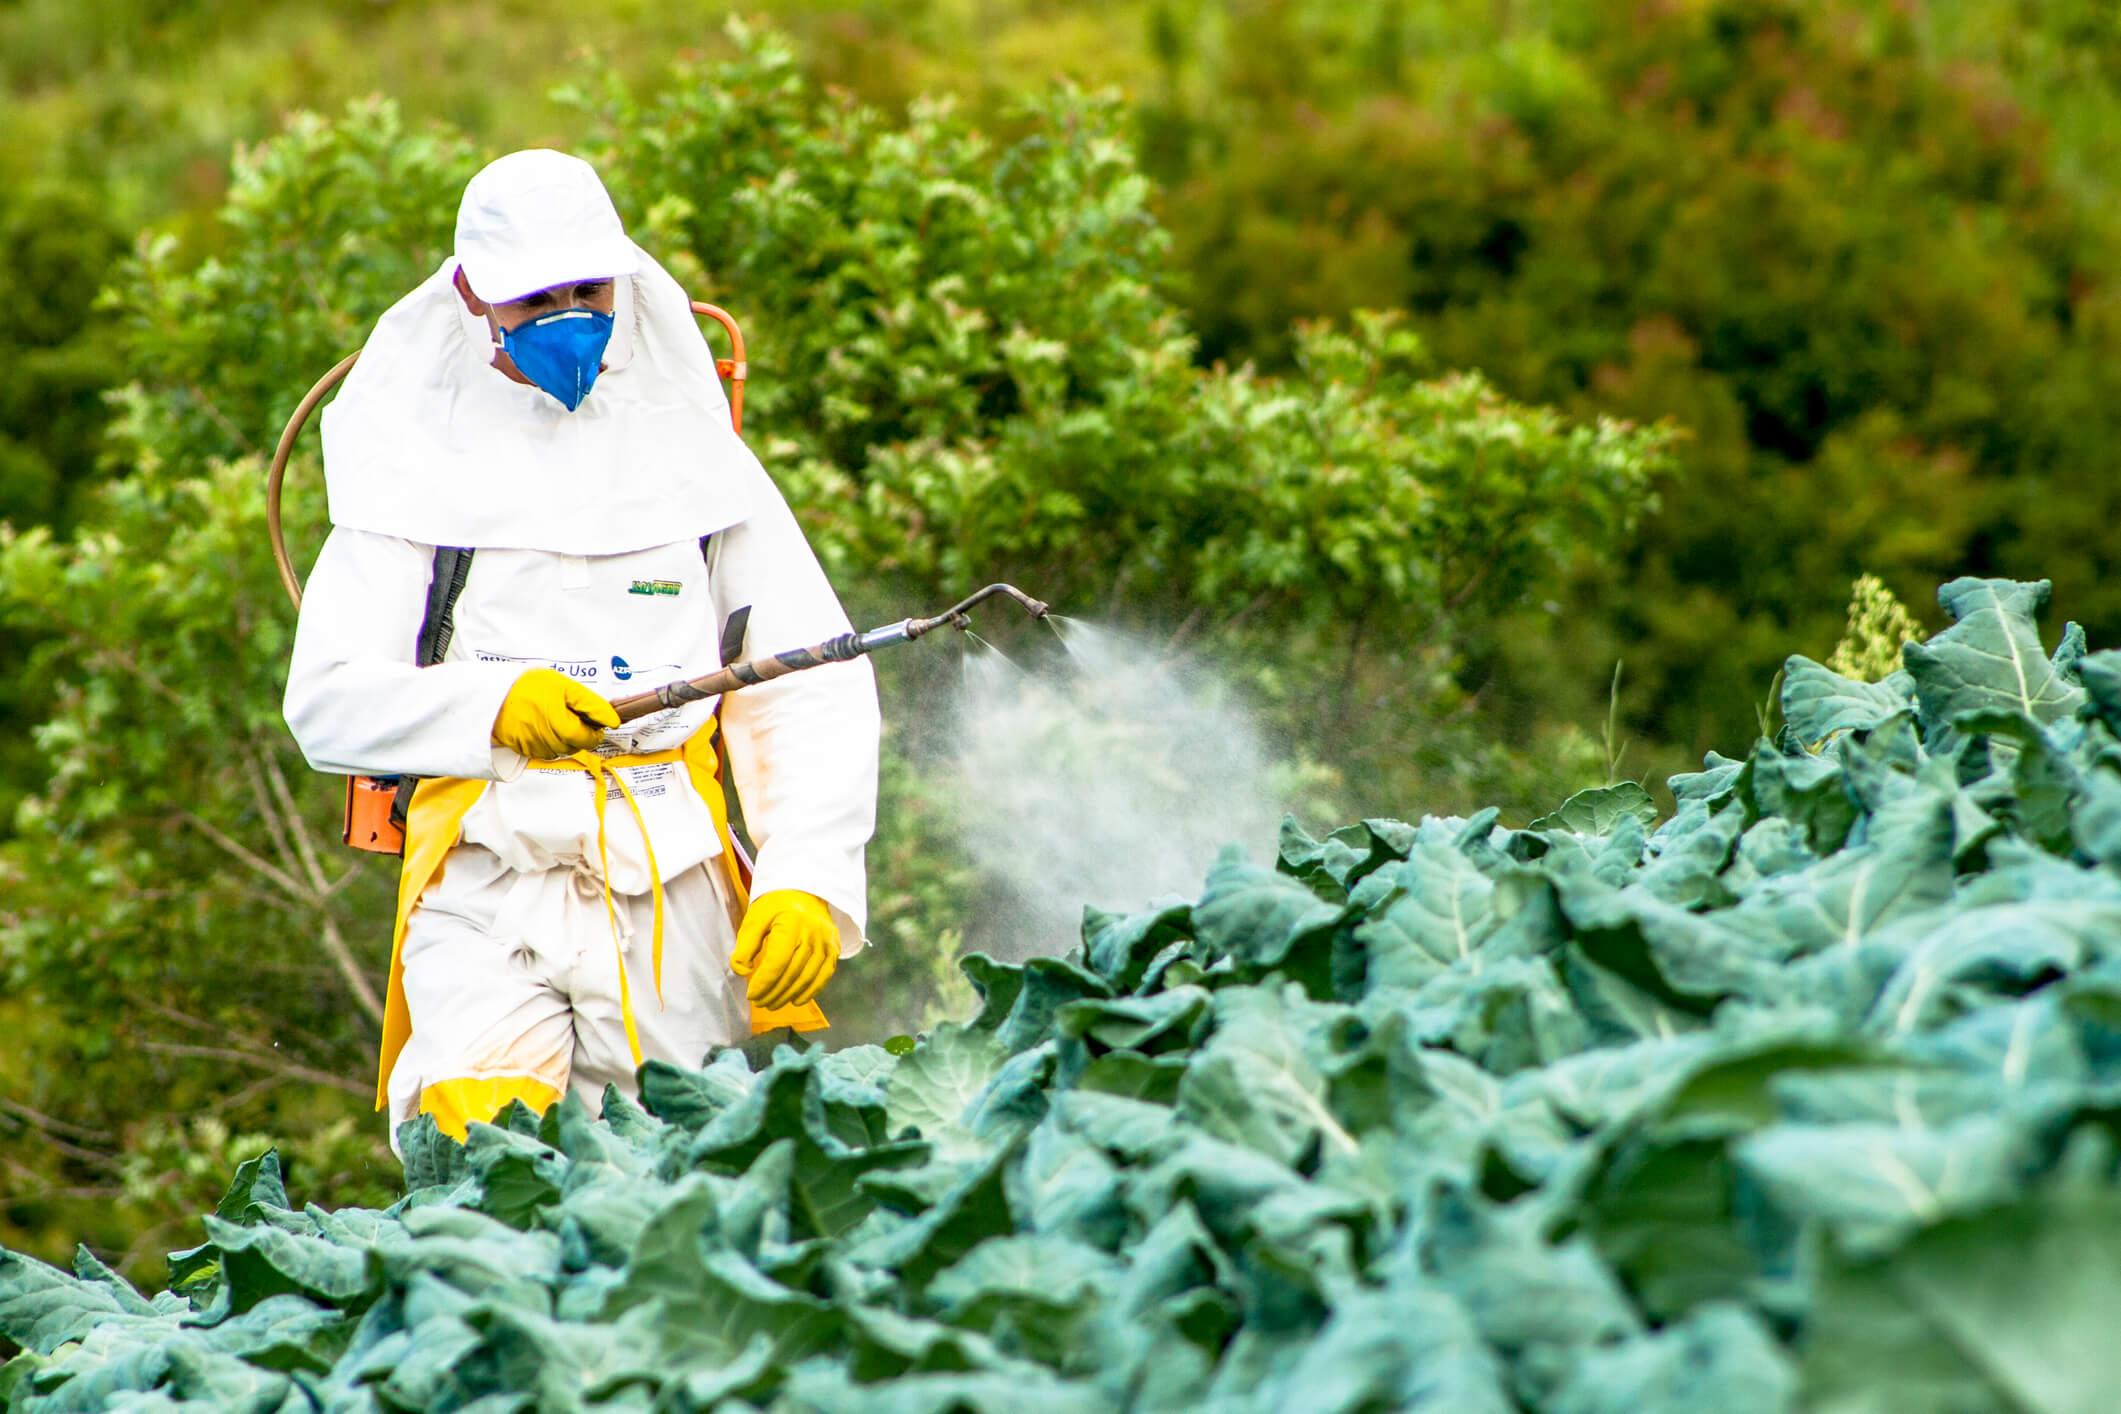 Man spraying pesticides on crops